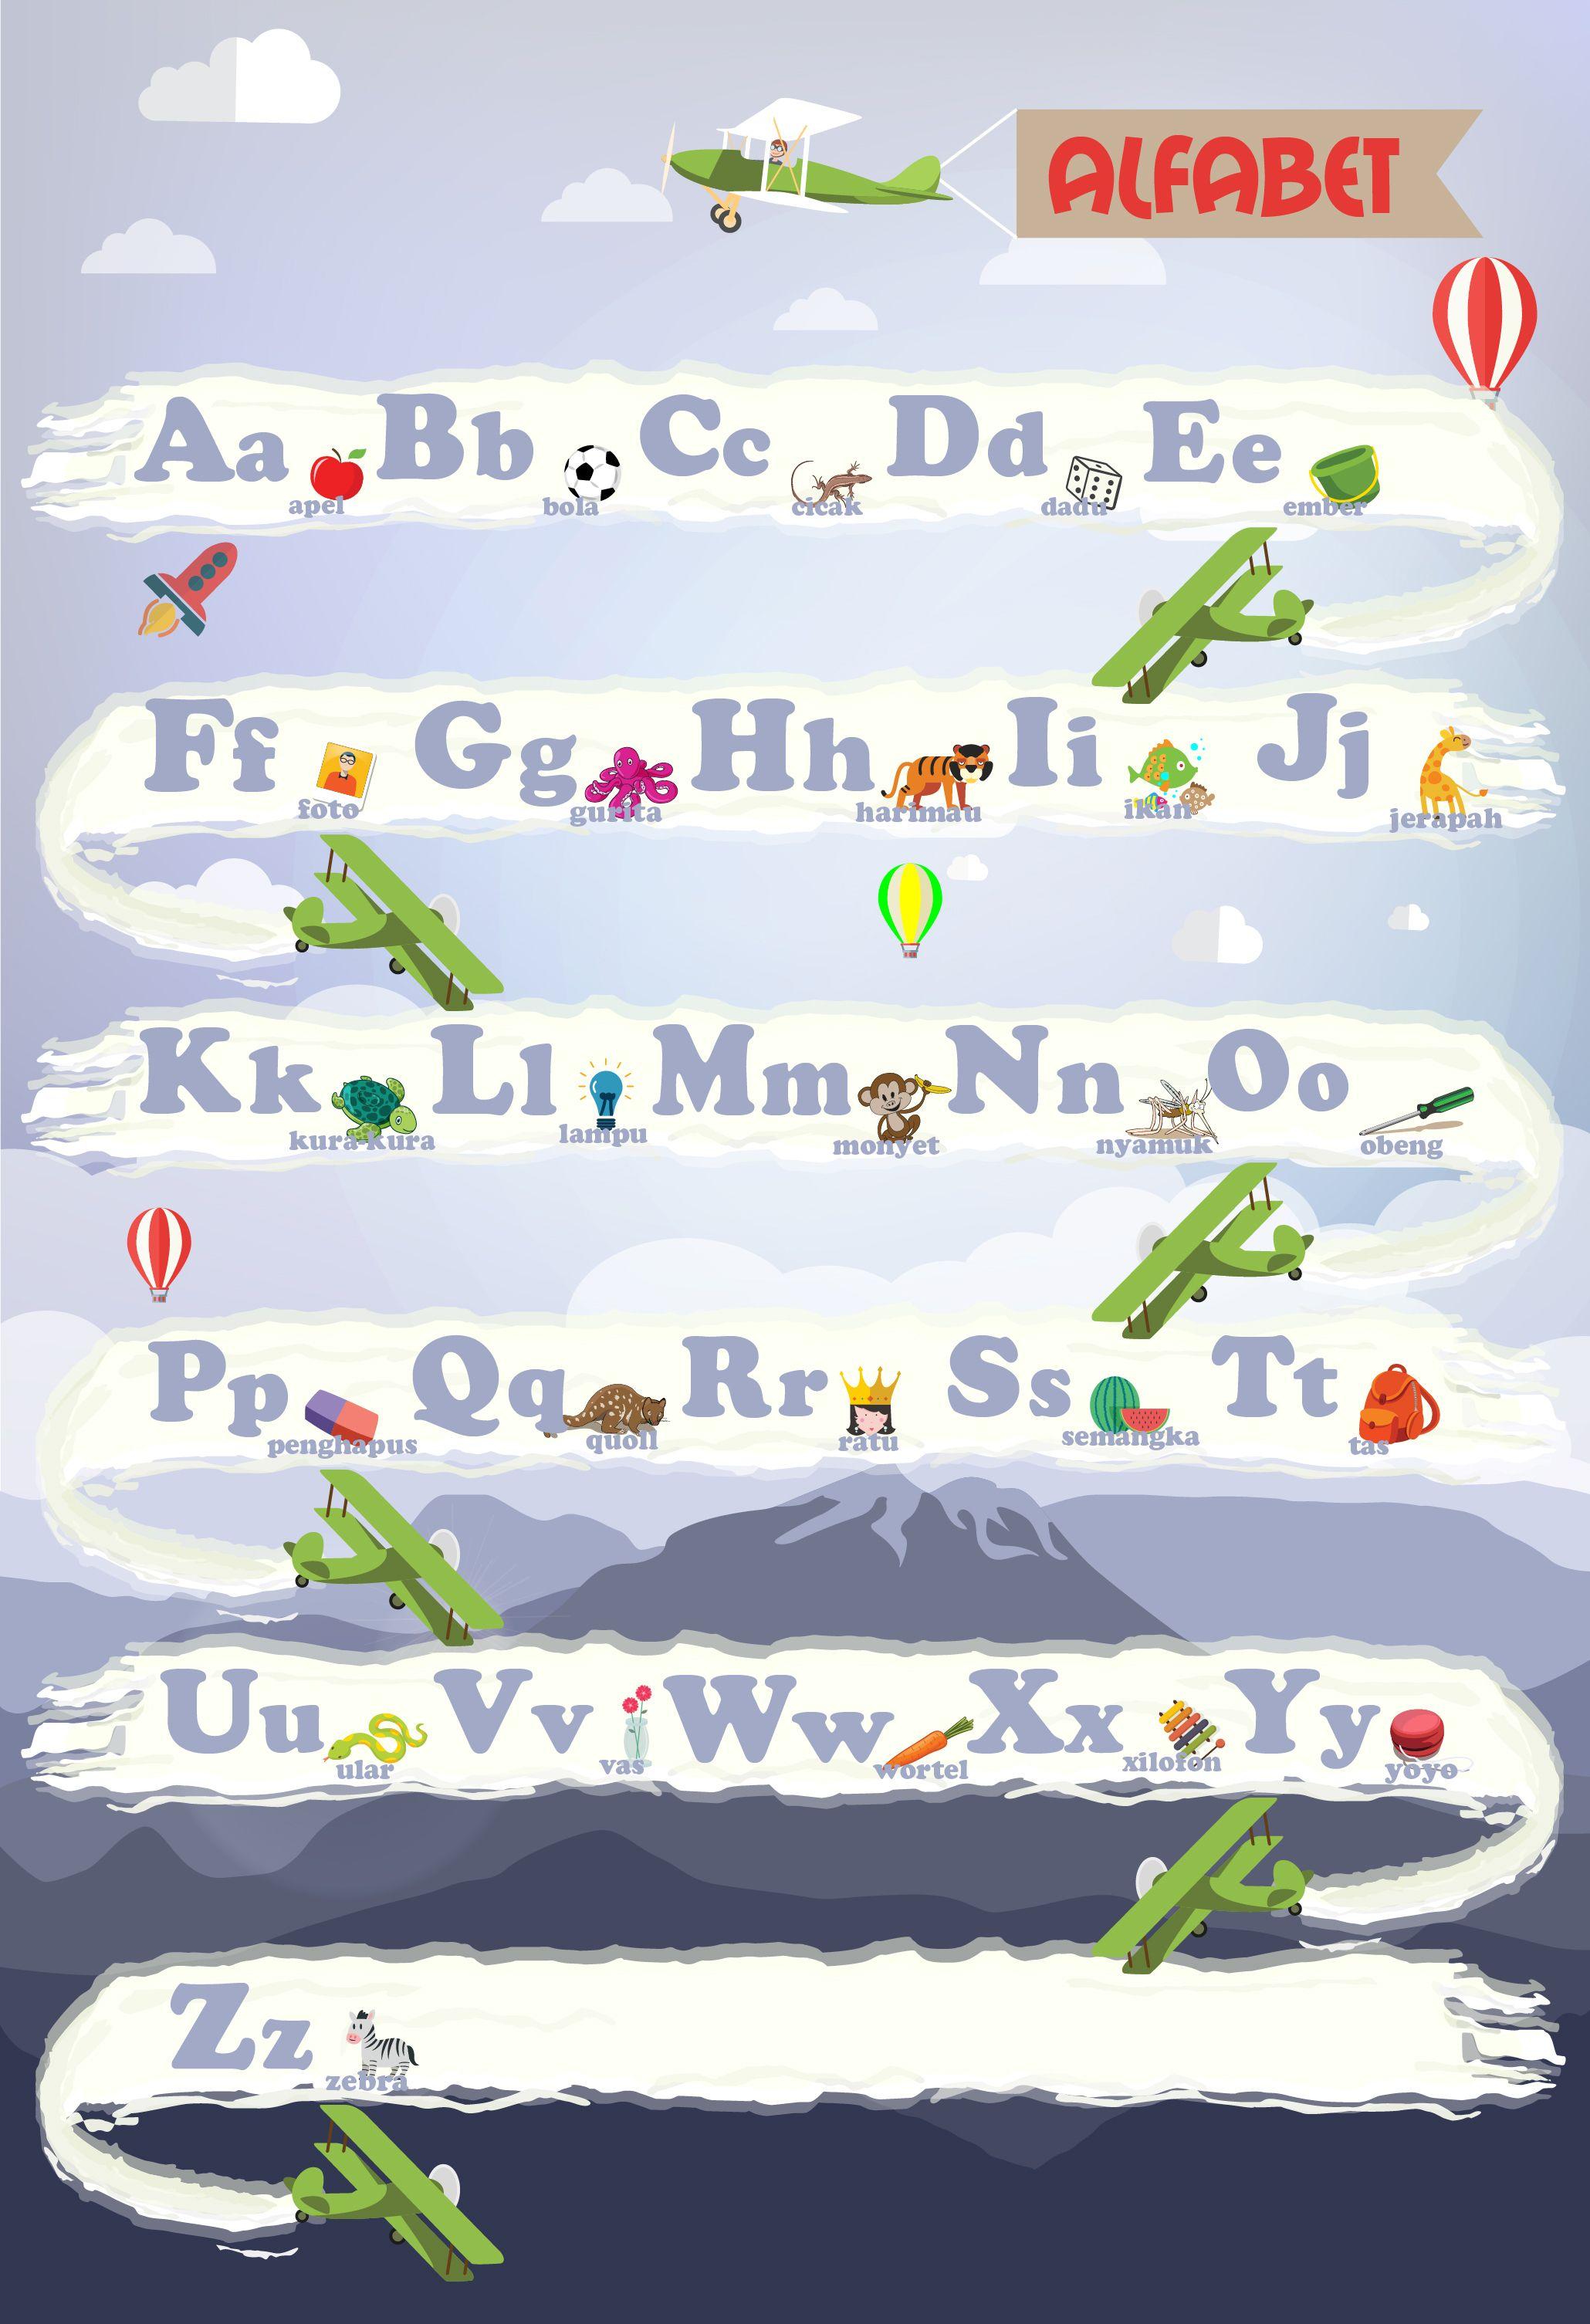 Indonesia Kids Alphabetic Poster Poster Alphabet Kids Vector Learning Fun Alphabet Jerapah Poster